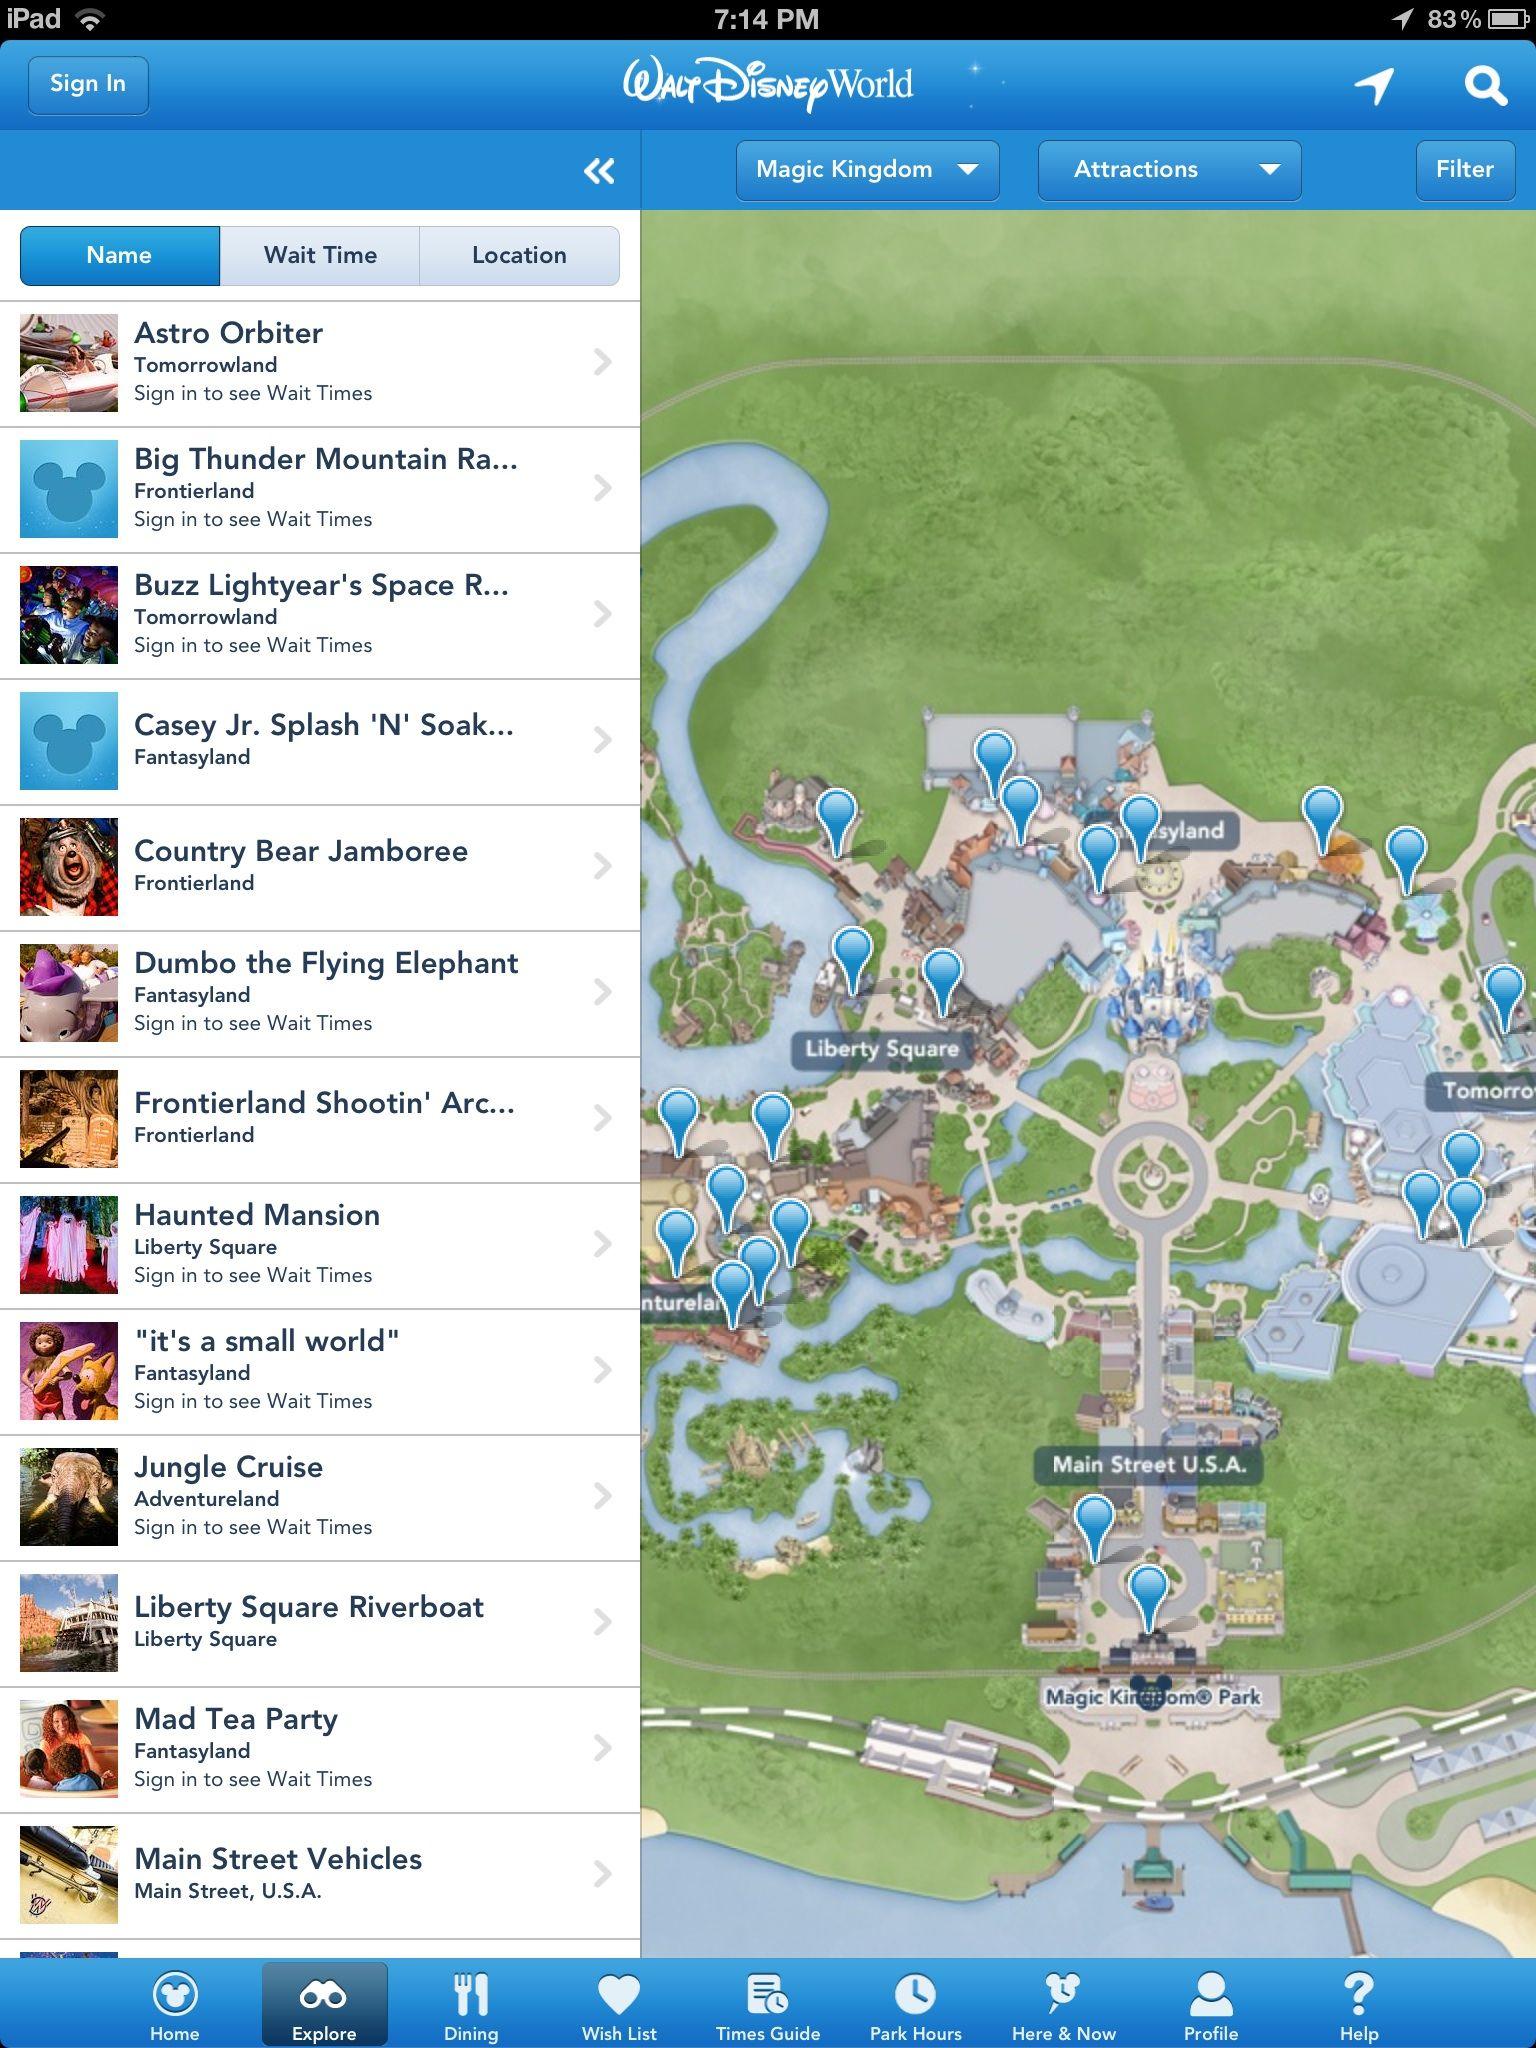 Walt Disney World launches 'My Disney Experience' app